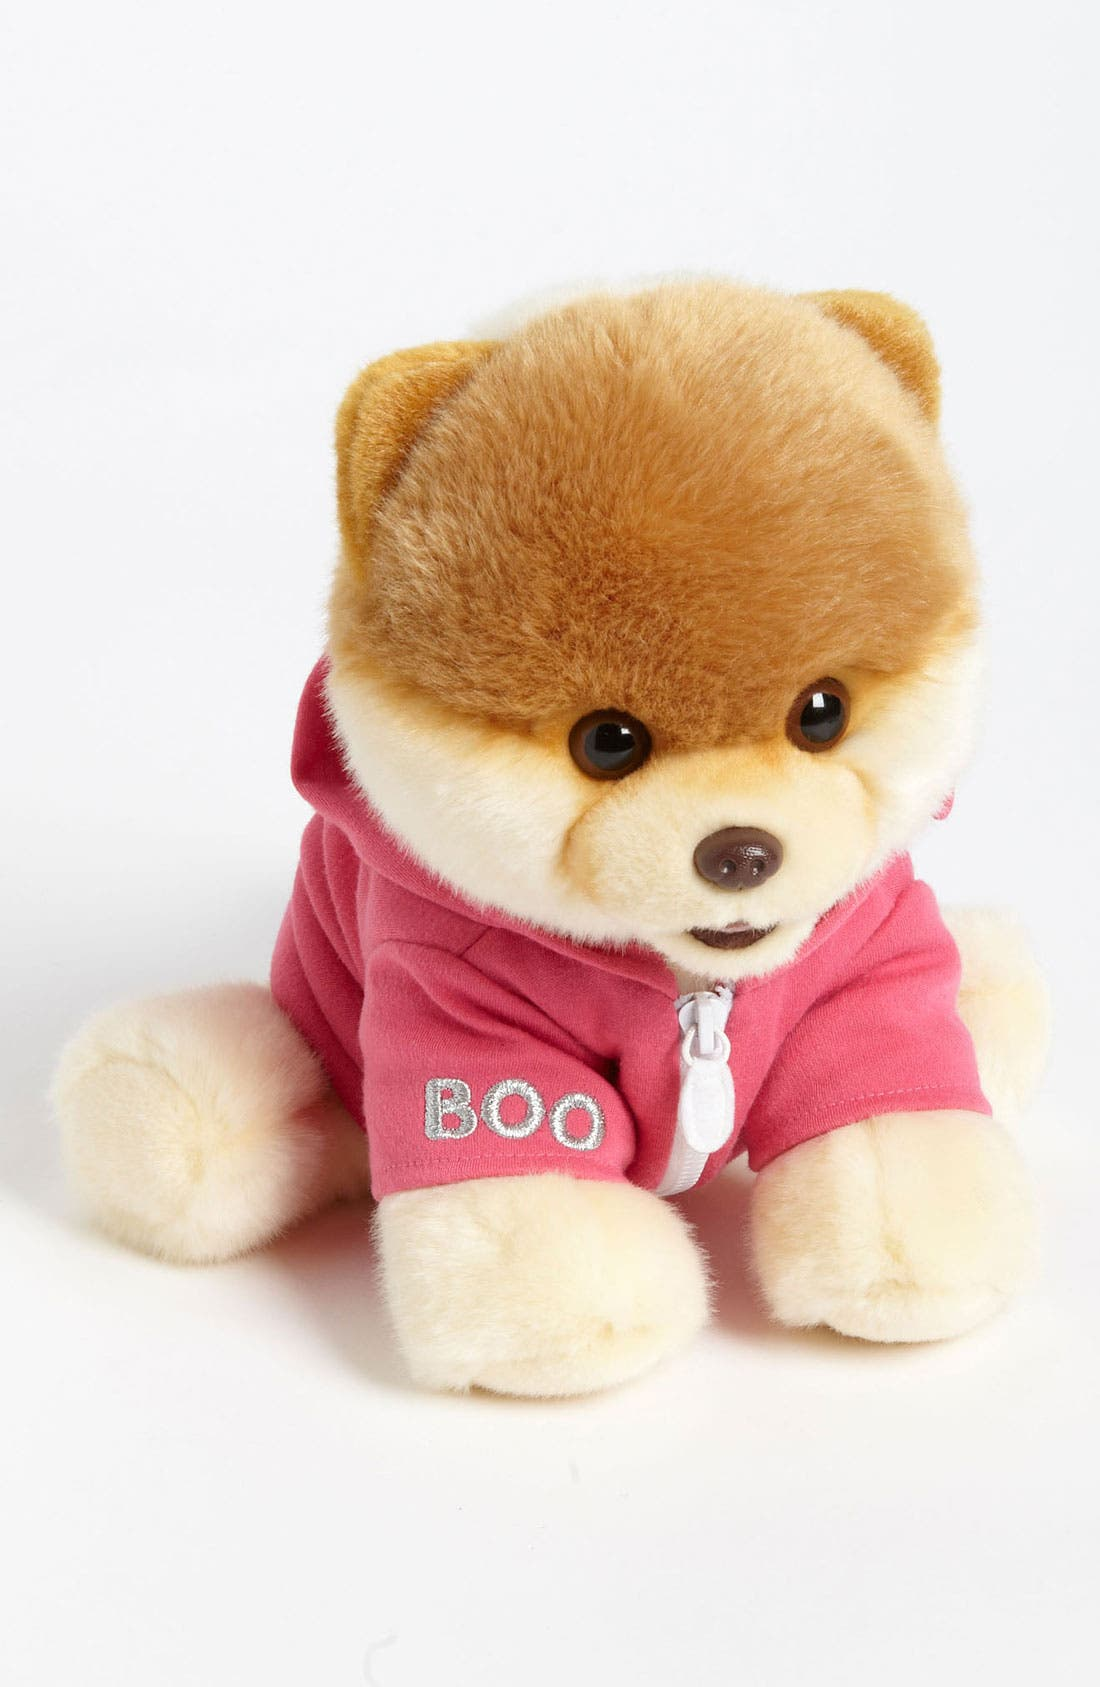 Main Image - Gund 'Boo - World's Cutest Dog' Life-Size Stuffed Animal